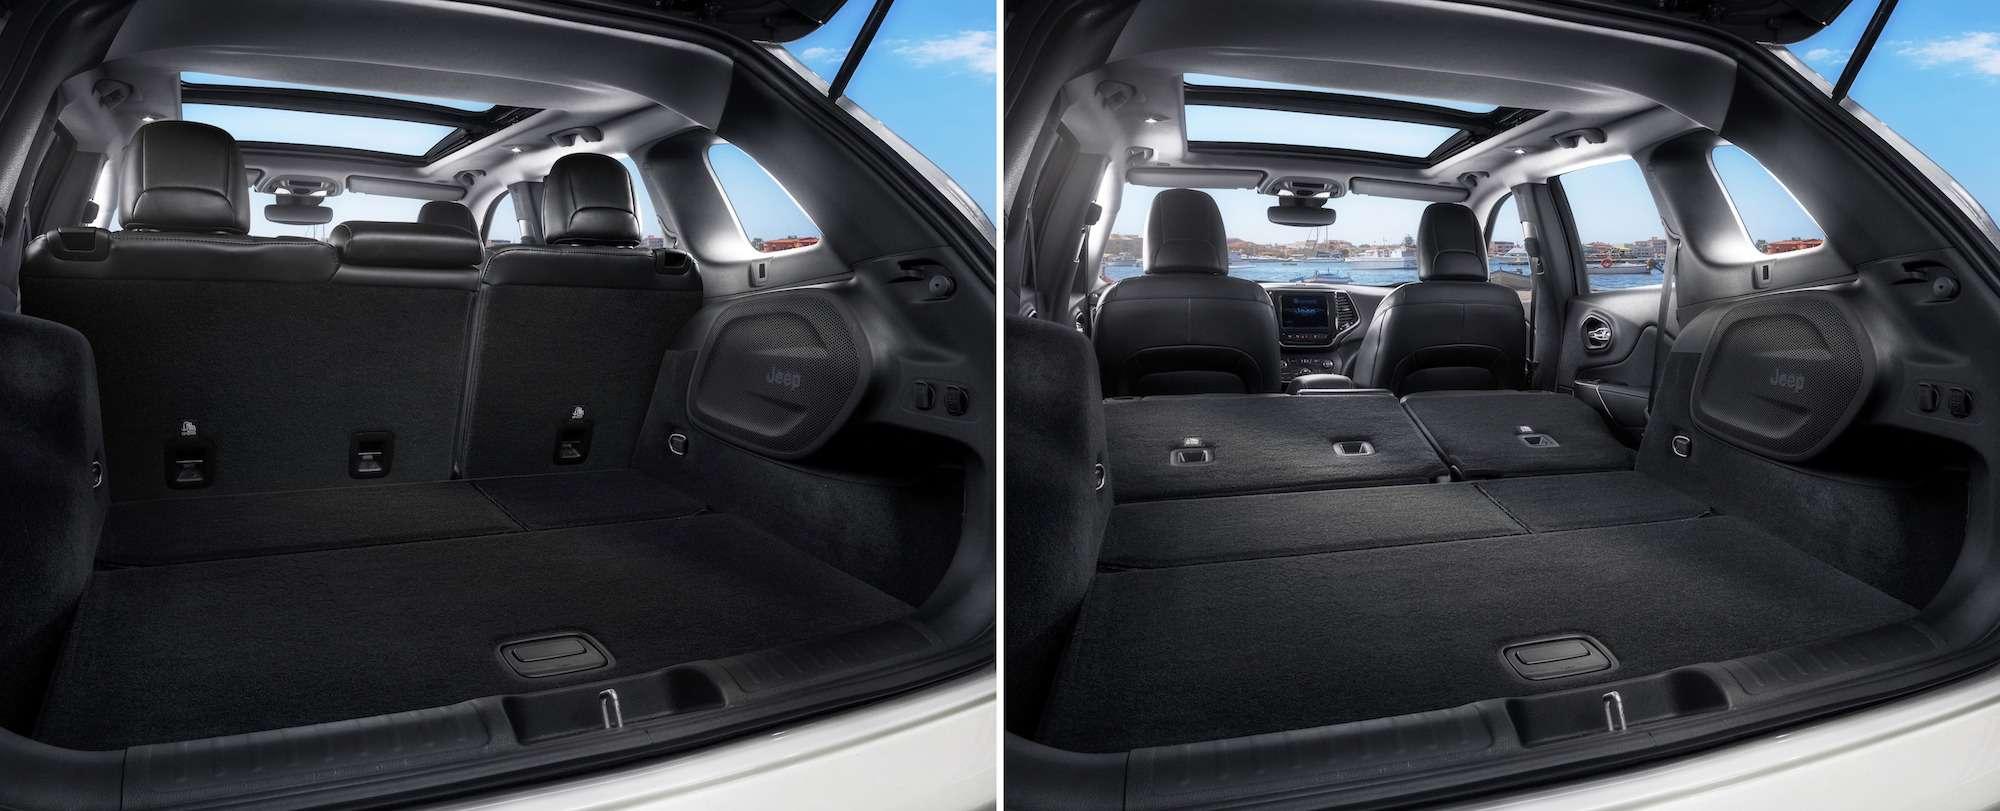 Jeep Cherokee 2019: первый тест-драйв— фото 910004